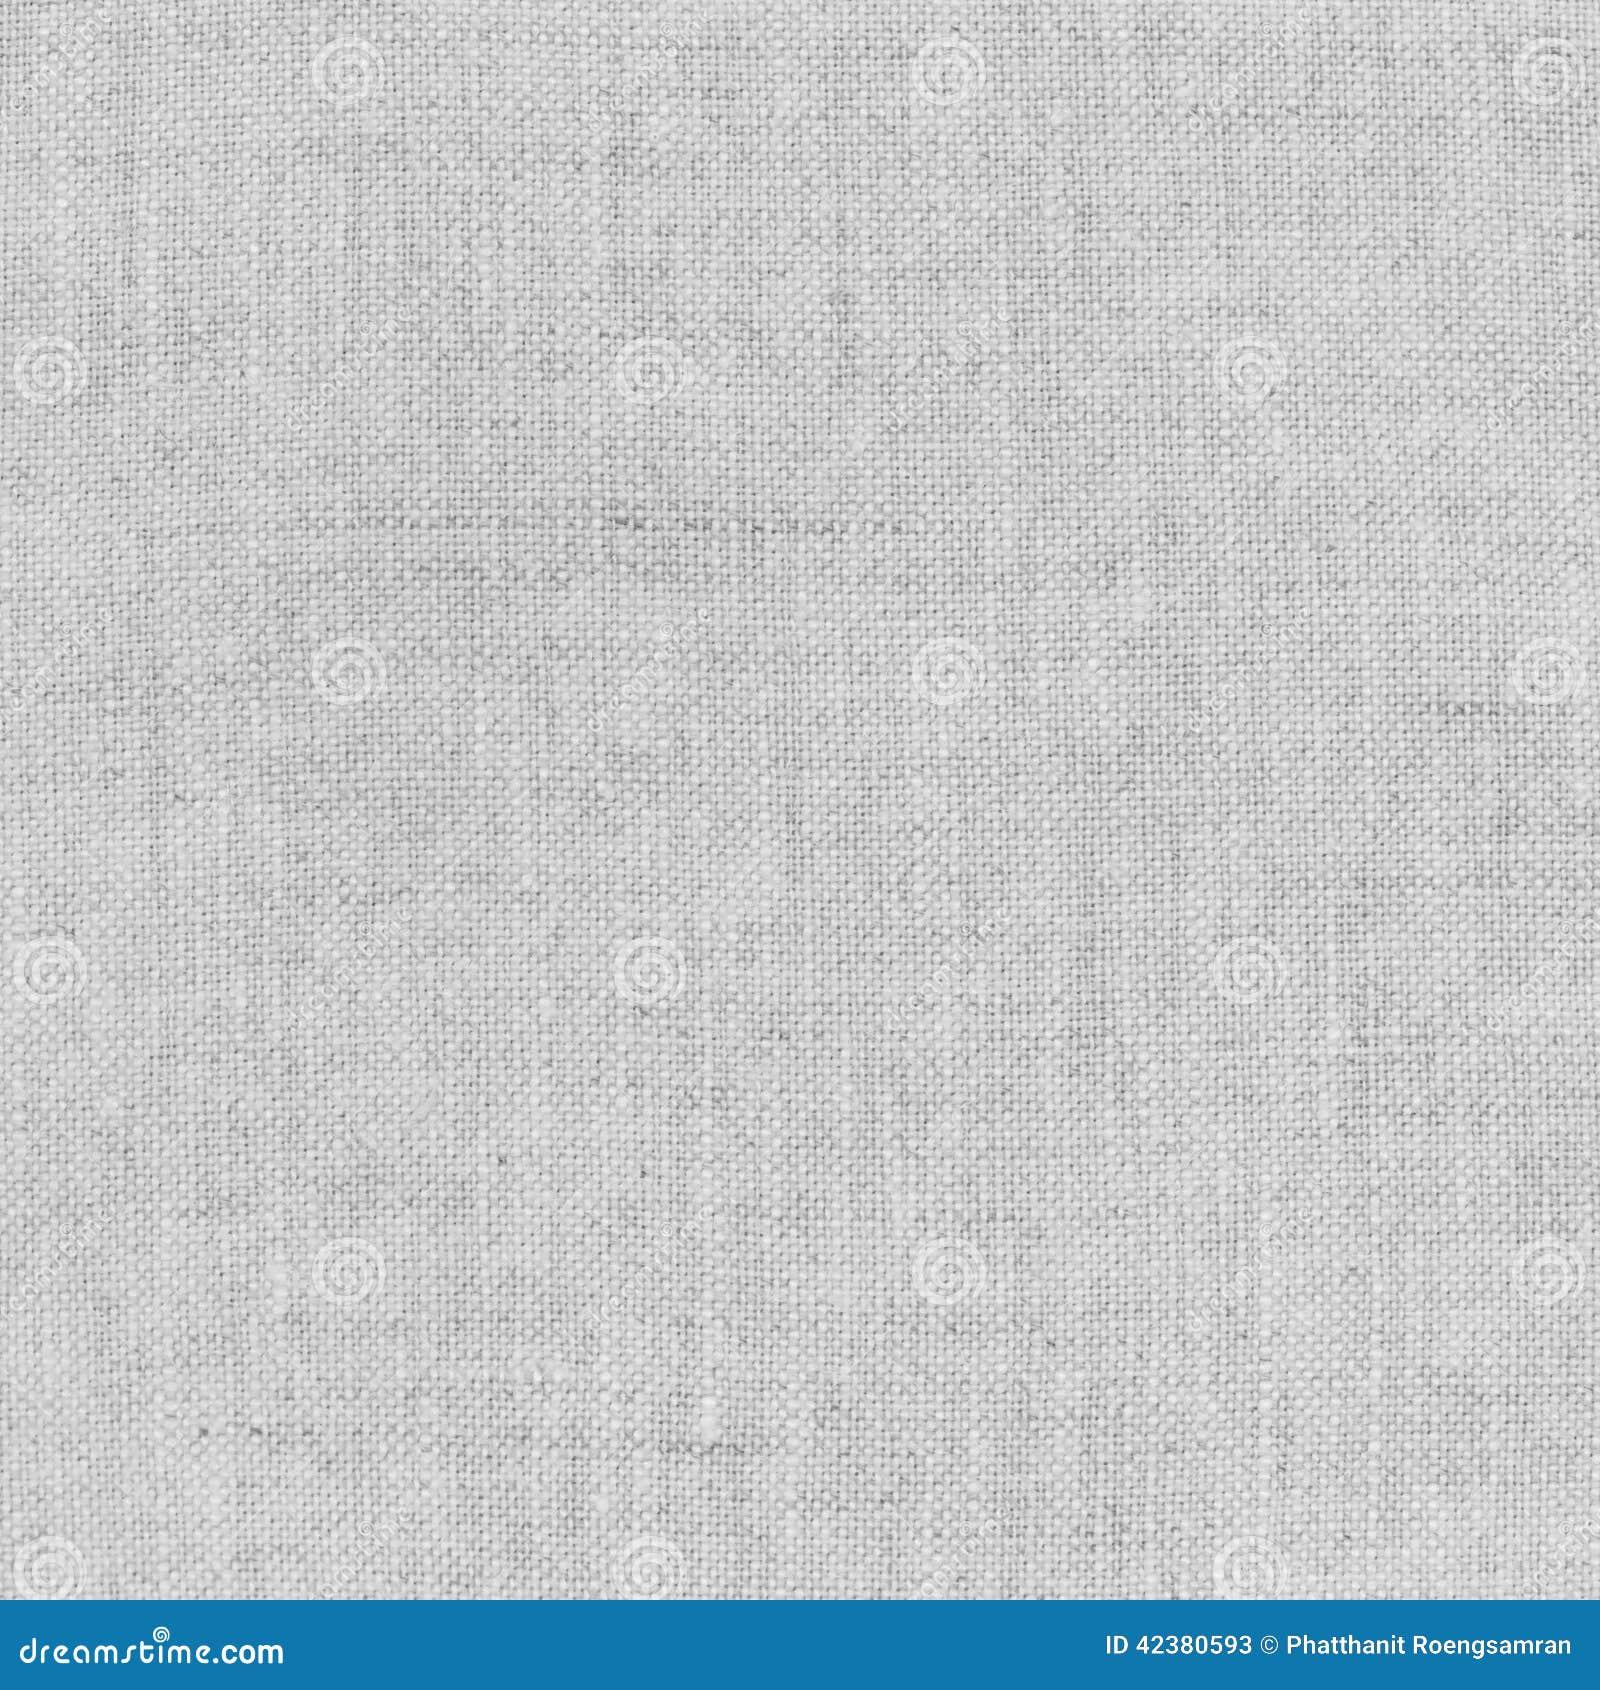 light gray natural linen texture for the background stock image image of natural jute 42380593. Black Bedroom Furniture Sets. Home Design Ideas